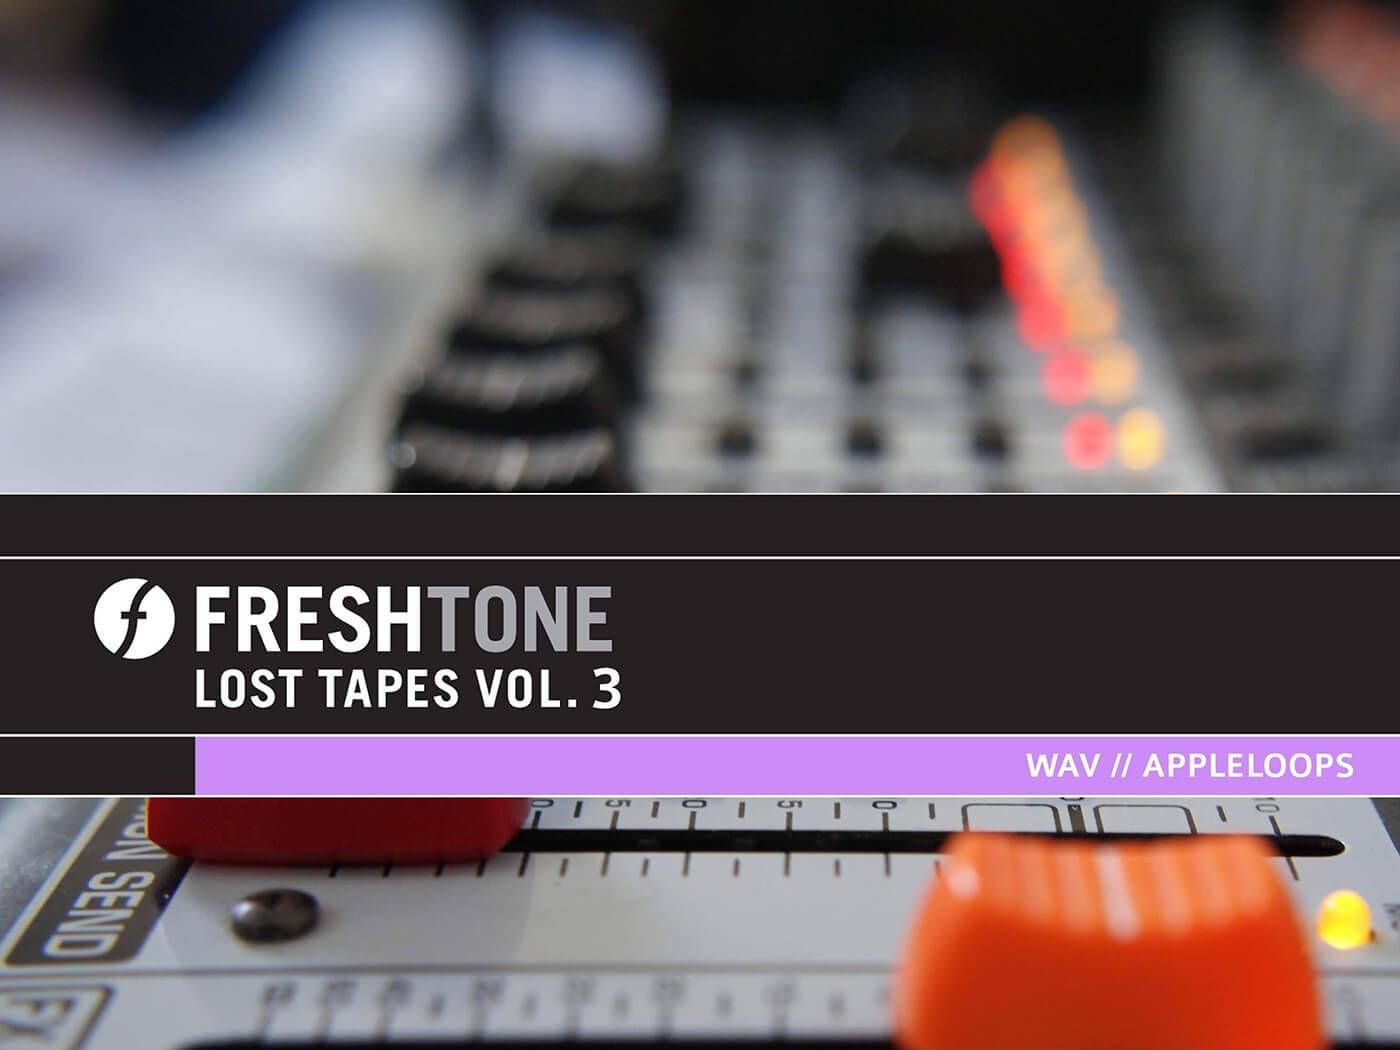 Freshtone Lost Tapes Vol. 3